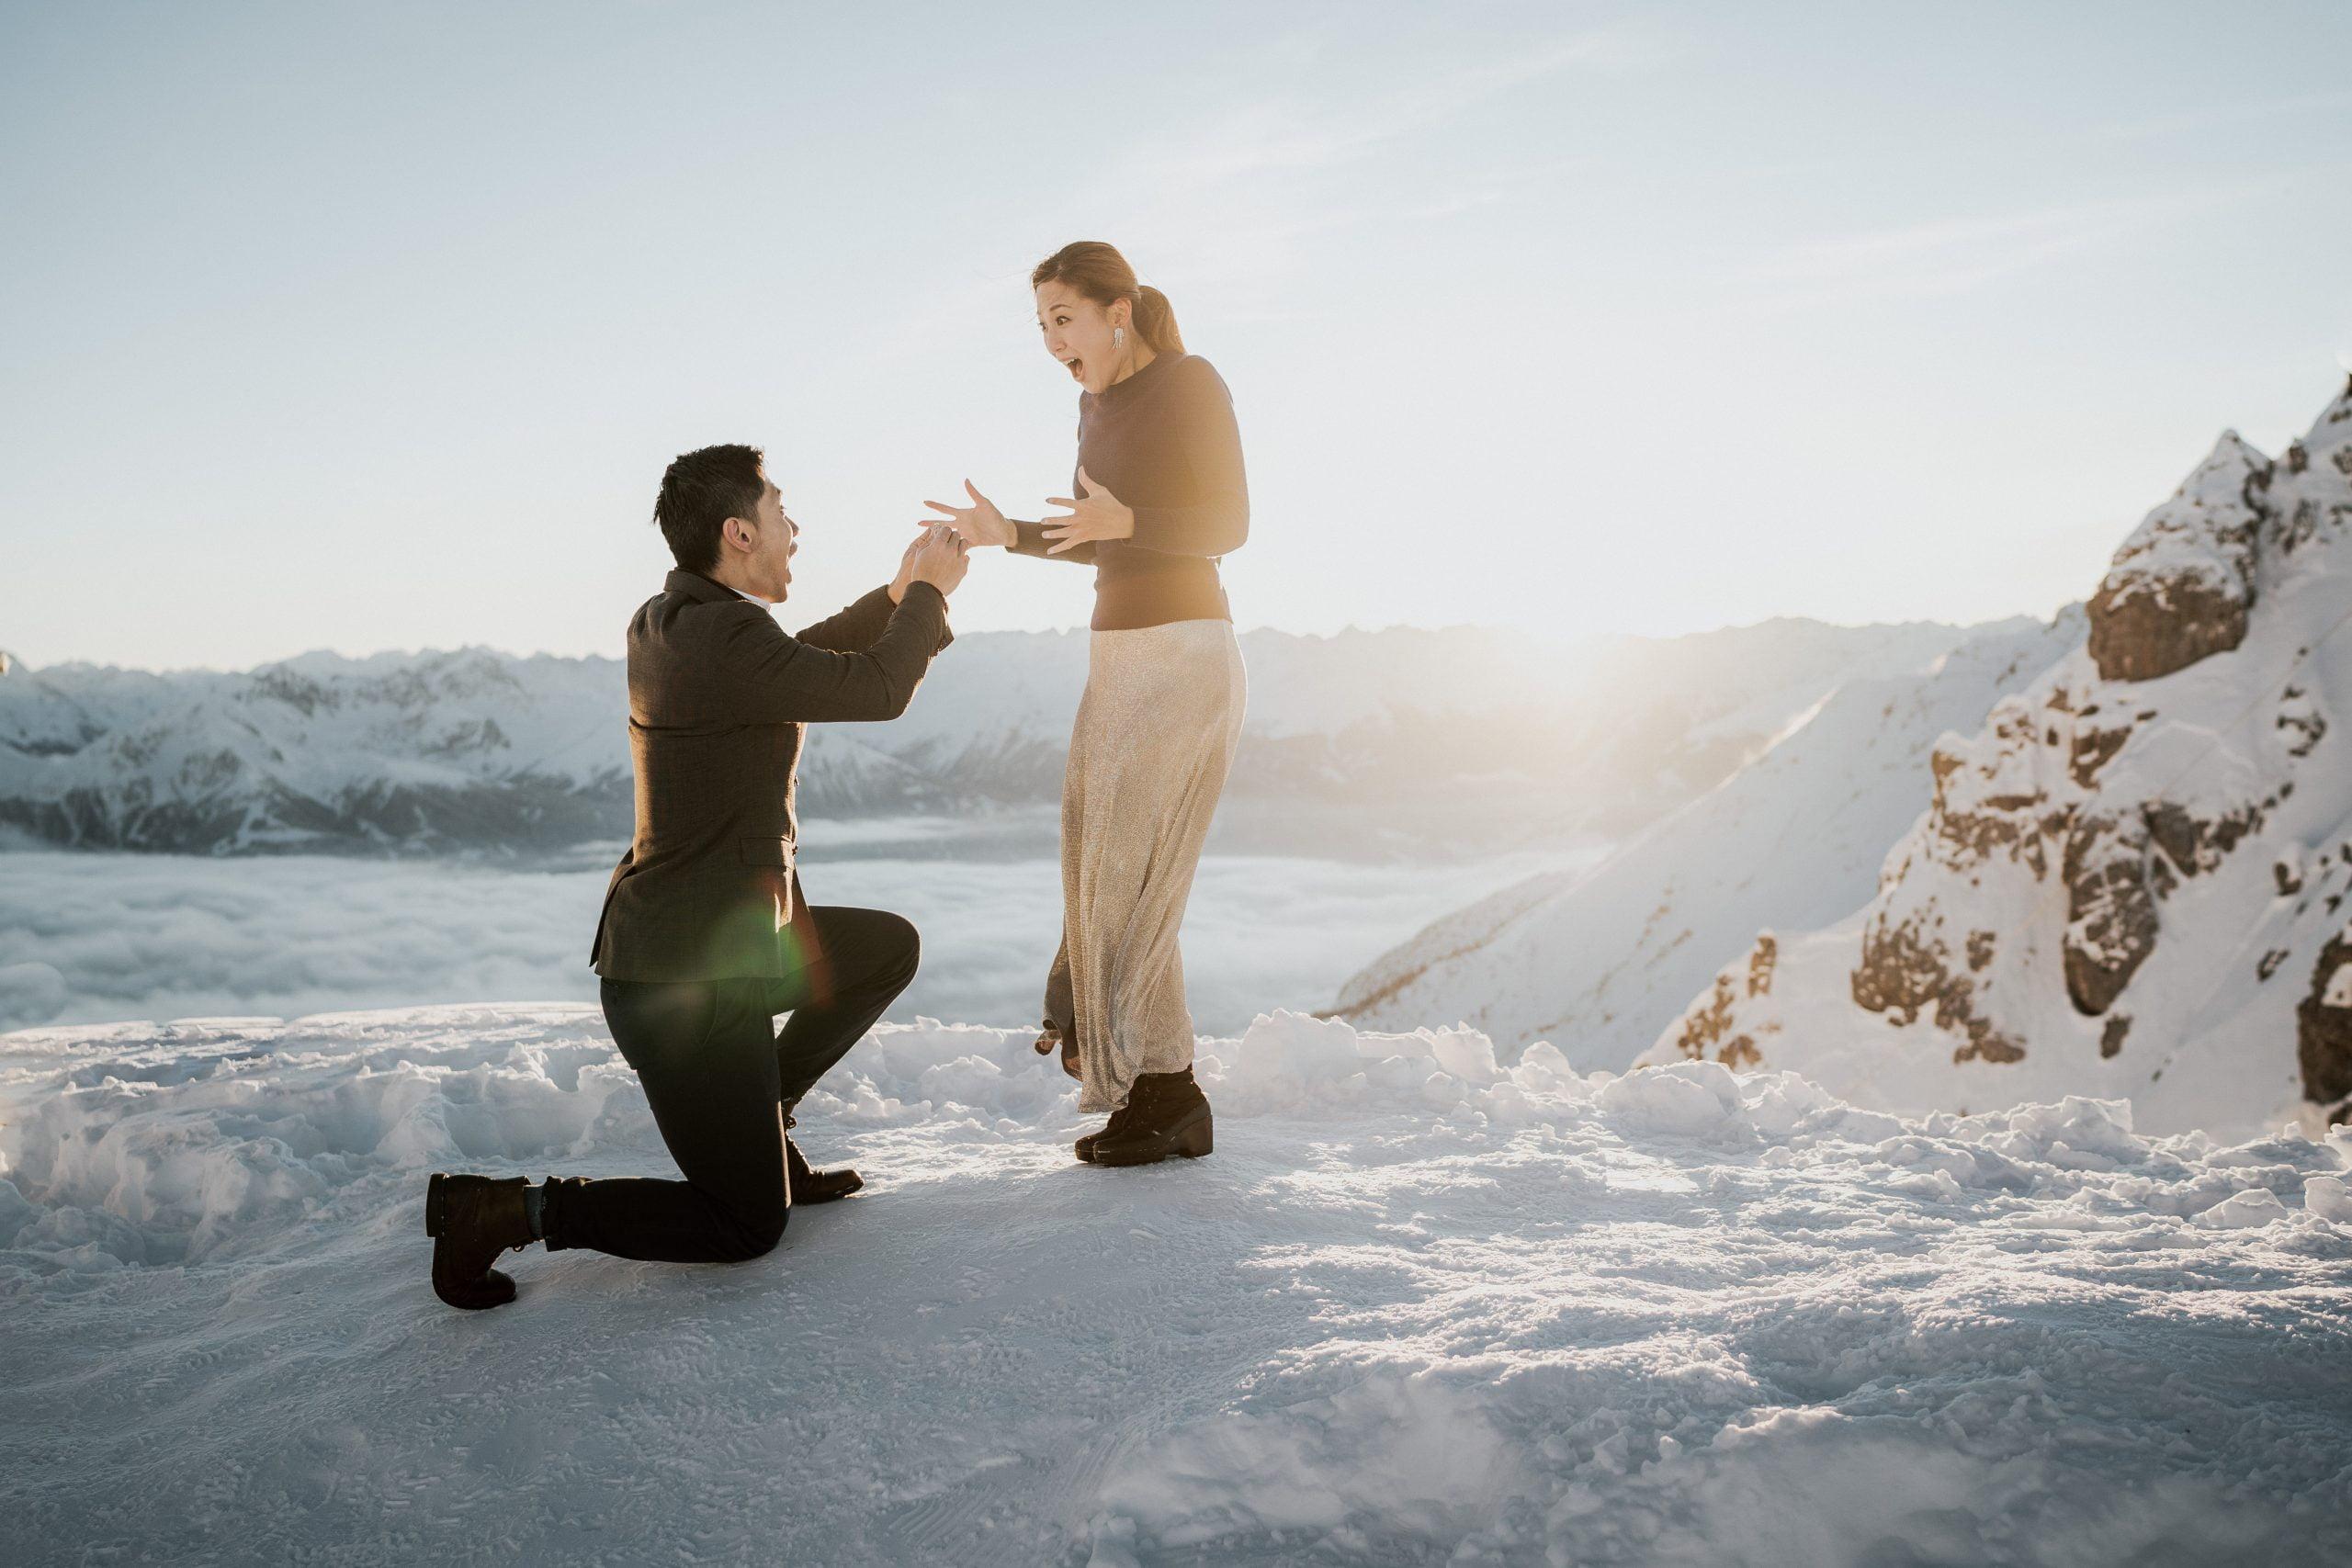 Blitzkneisser-Engagement-Shooting-Nordkette-Innsbruck-Photo-76